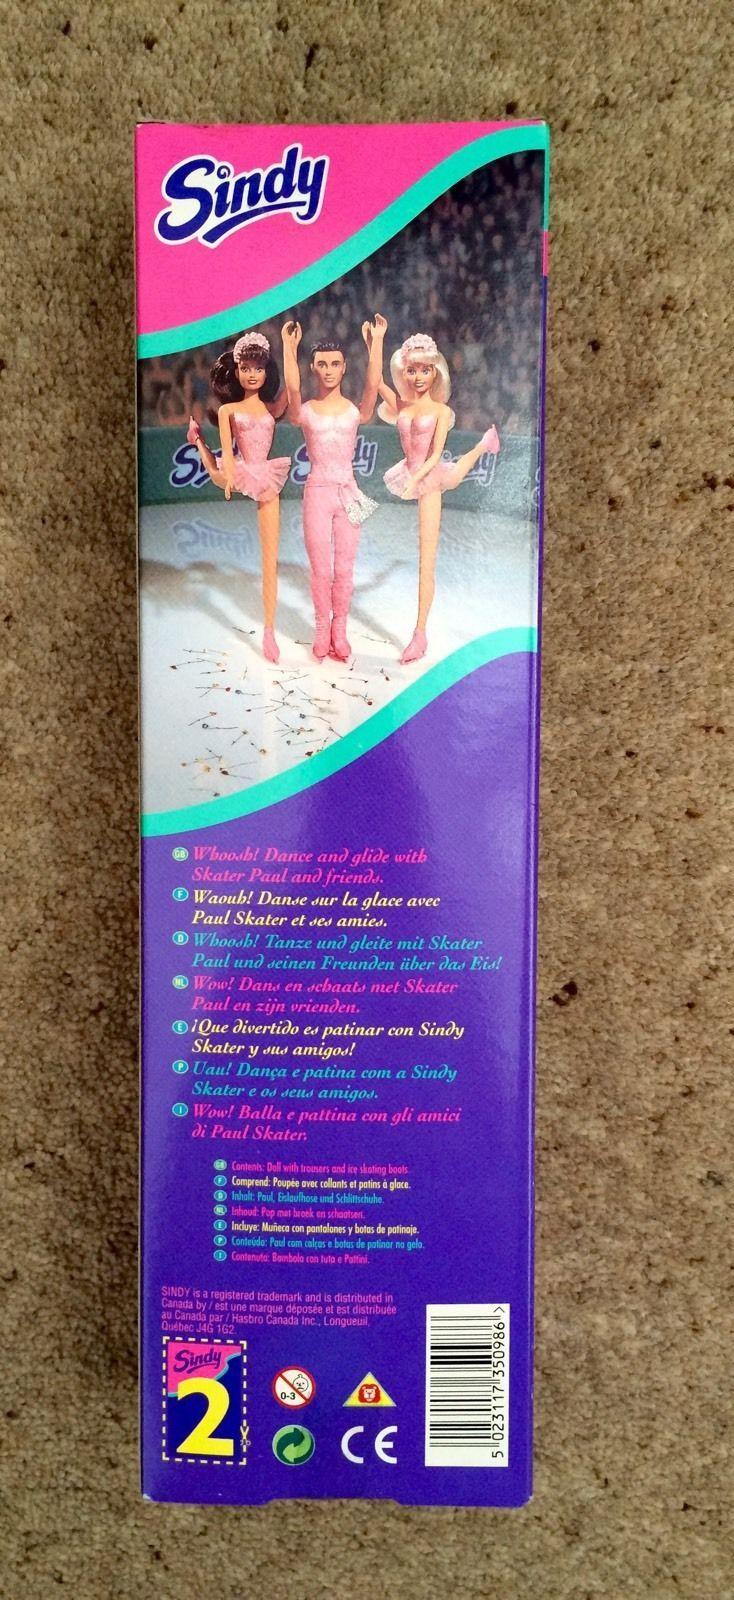 Sindy Doll Skater Paul Brand New In Box 1996 | eBay